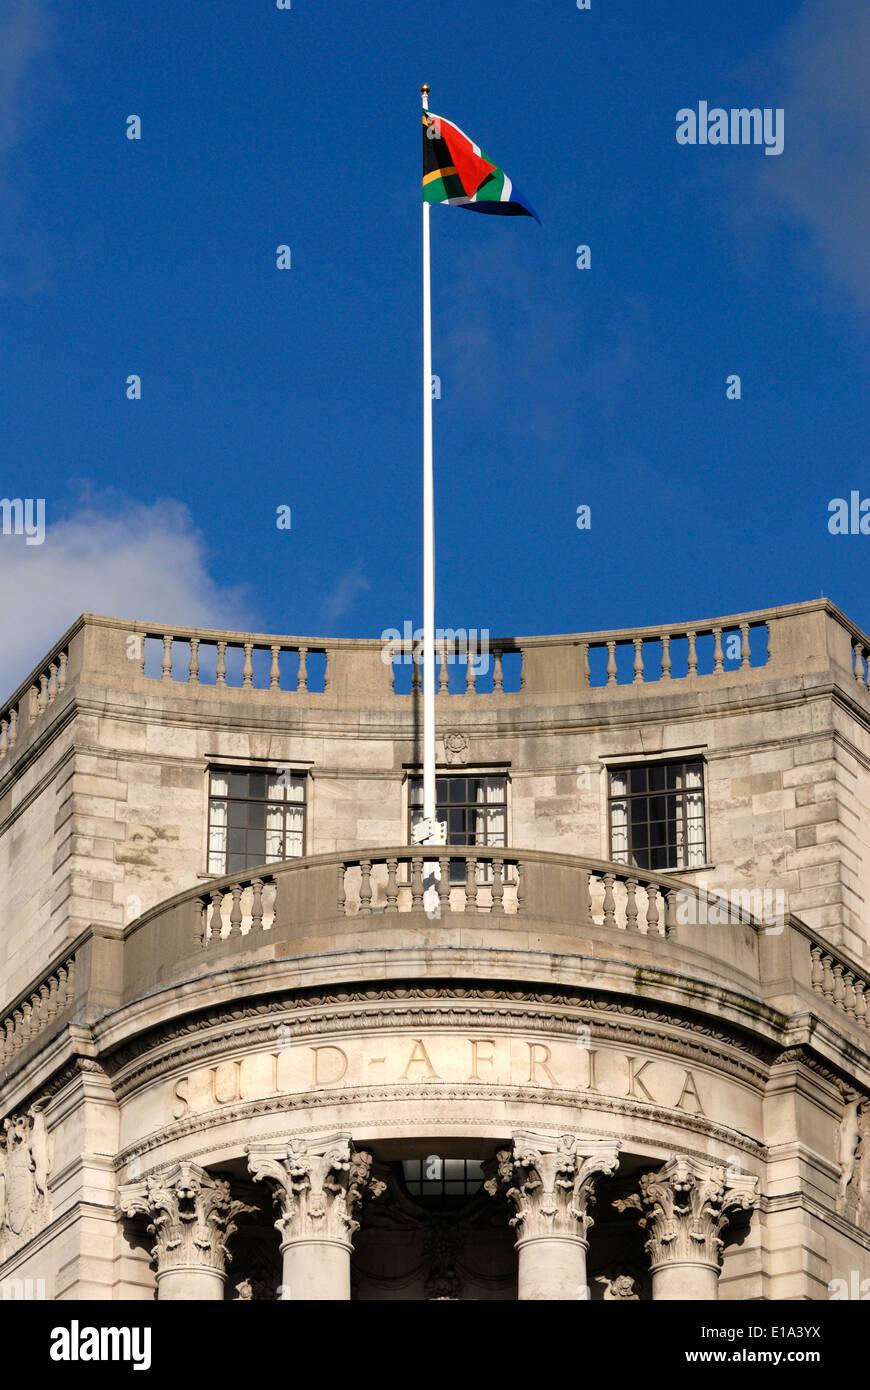 London, England, UK. South Africa House in Trafalgar Square - Stock Image